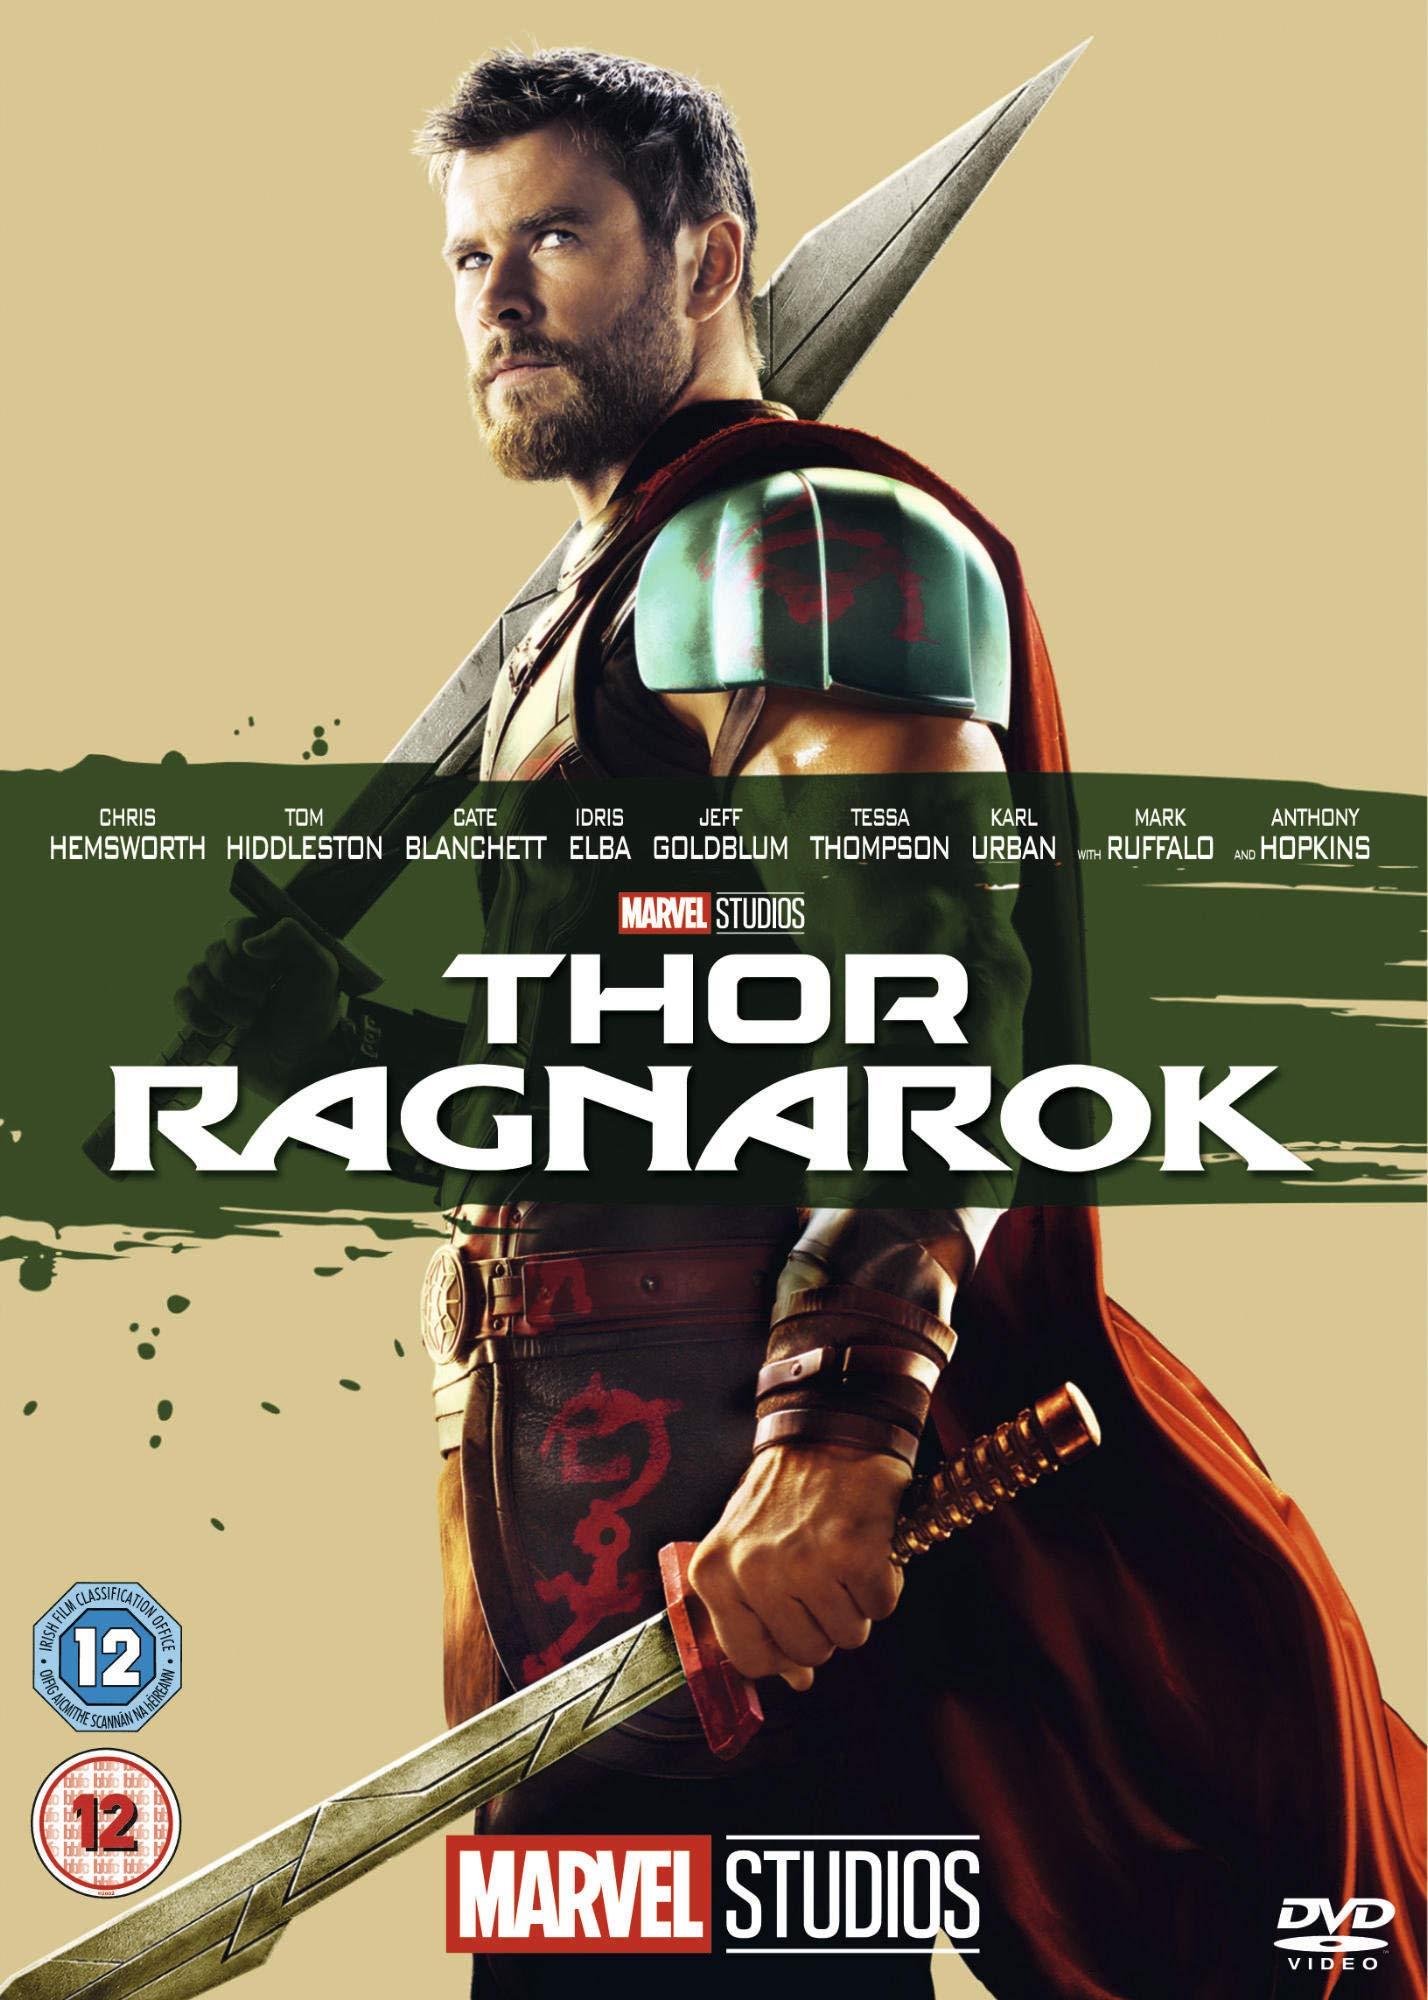 Marvel Cinematic Universe film 17 - Thor: Ragnarok